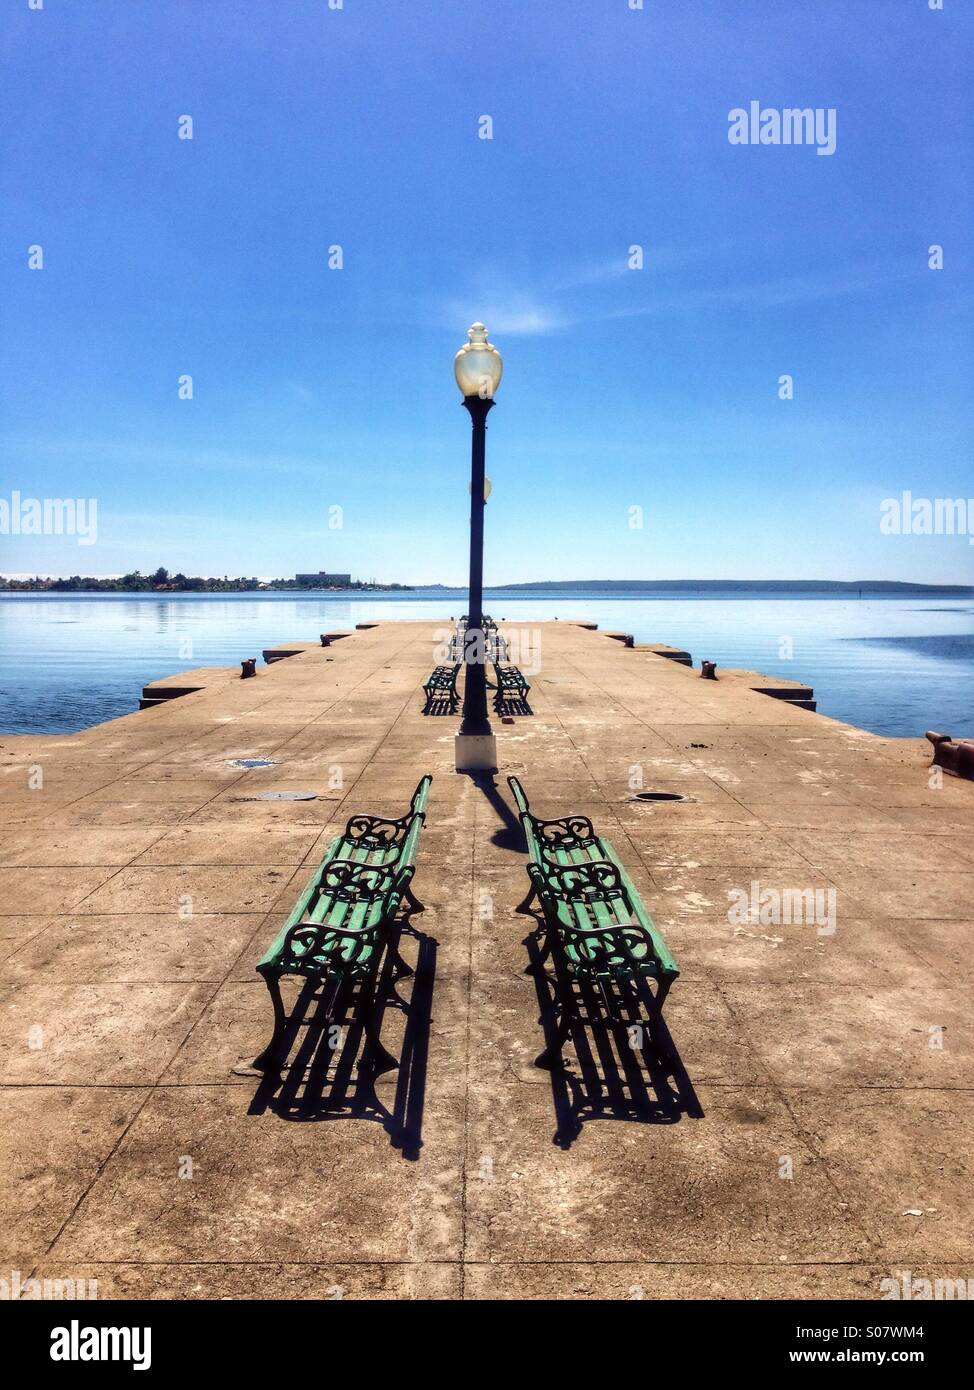 Kai im Hafen von Cienfuegos Kuba. Stockbild